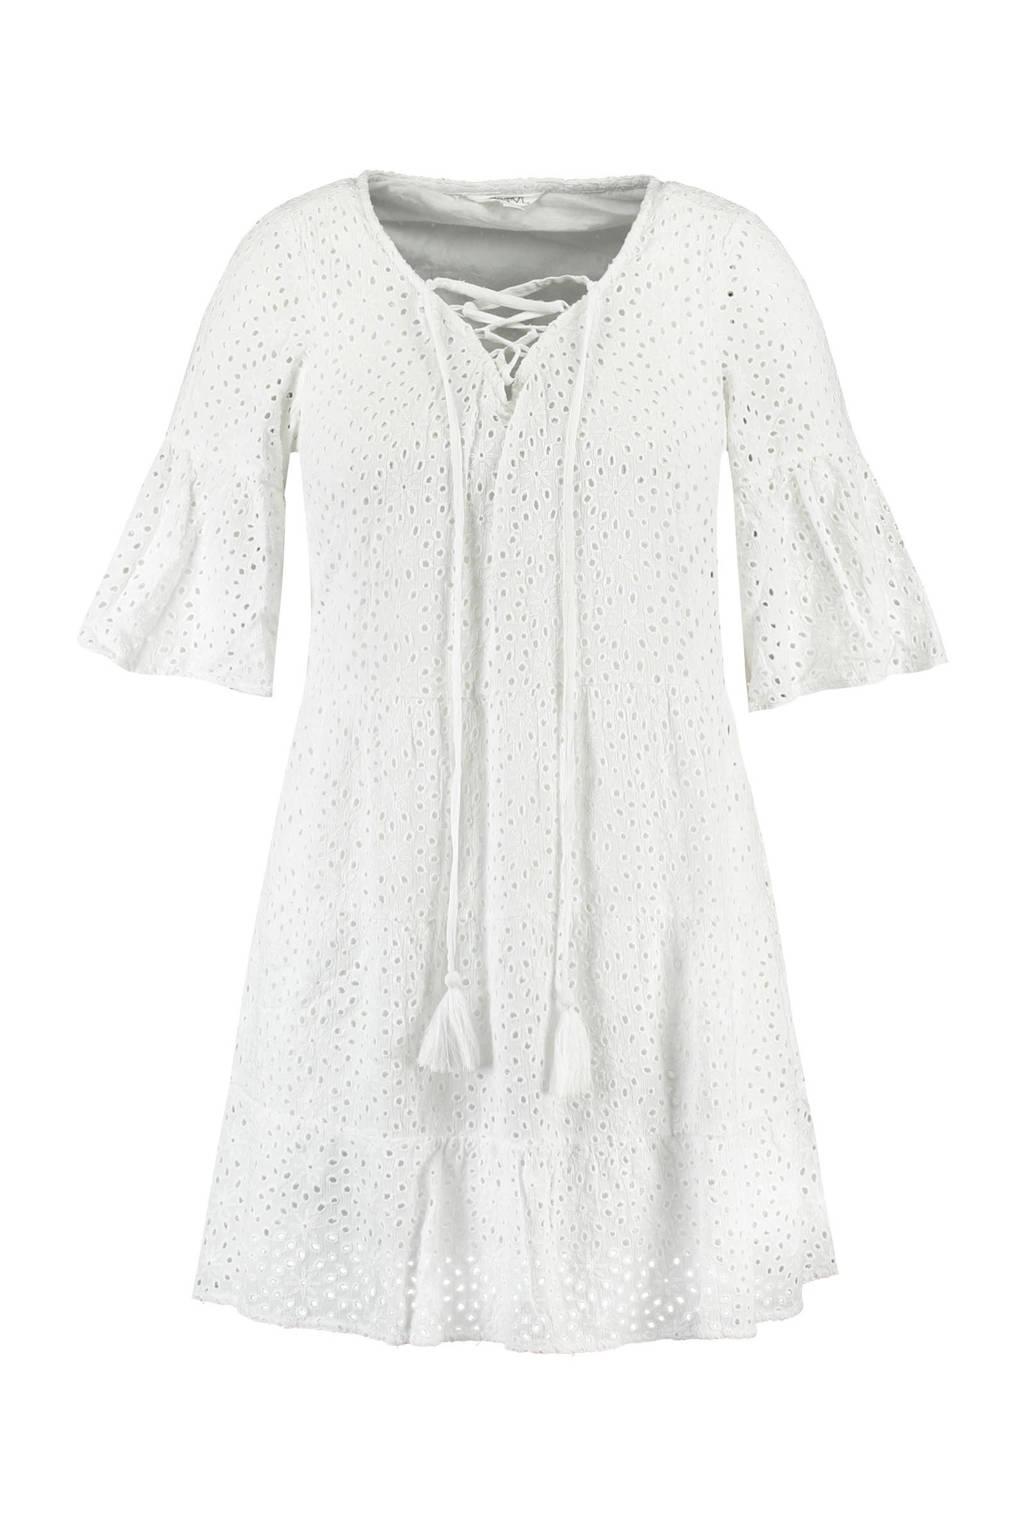 FSTVL by MS Mode A-lijn jurk wit, Wit